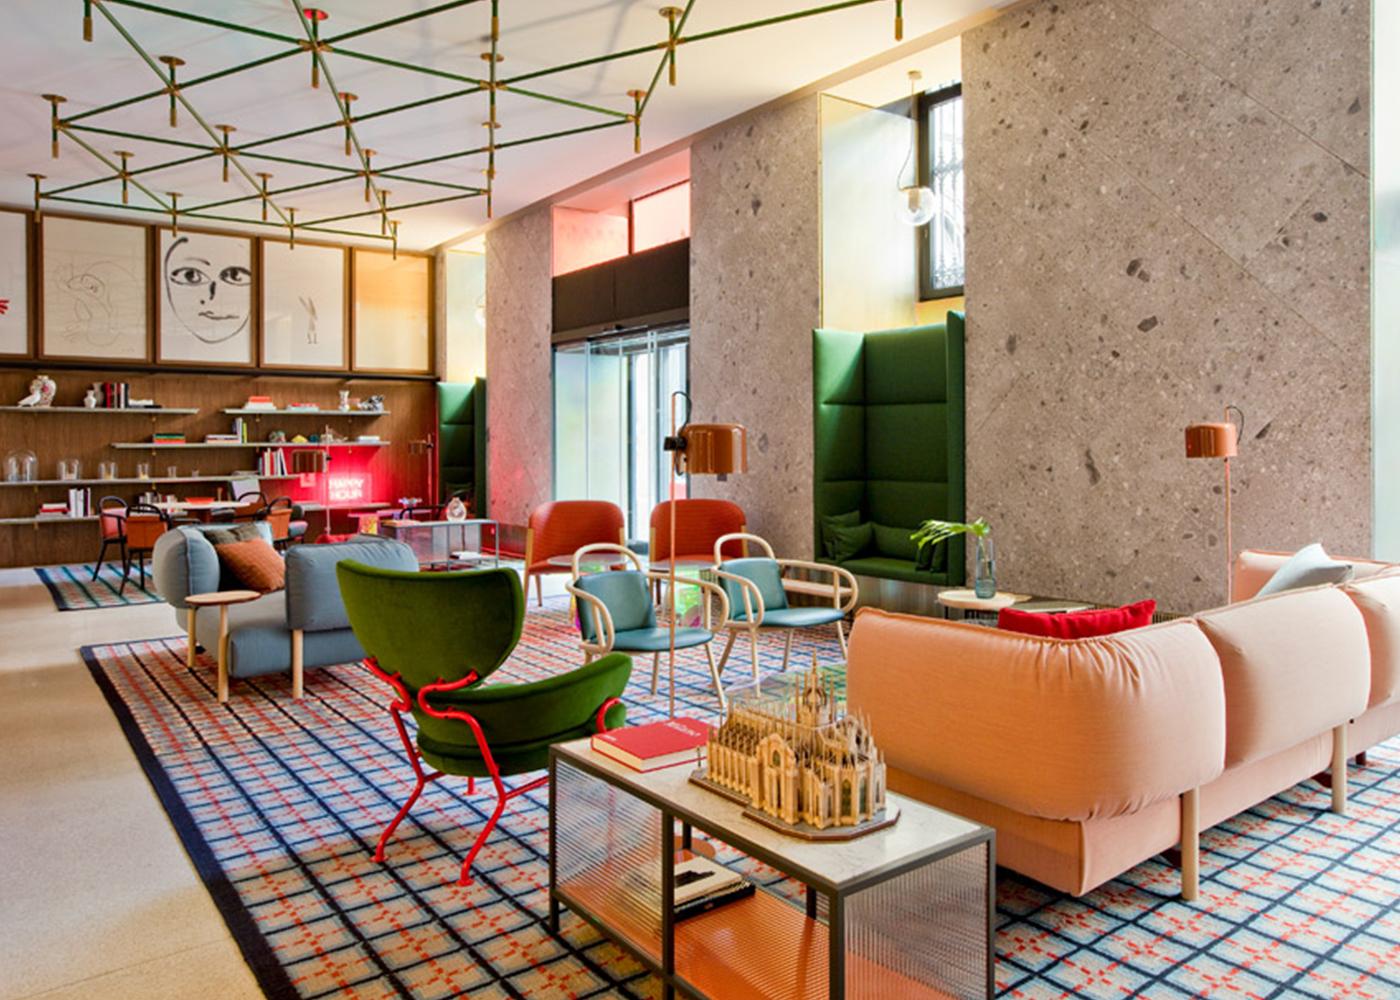 patricia-urquiola-room-mate-hotels-interior-design-milan_dezeen_936_3